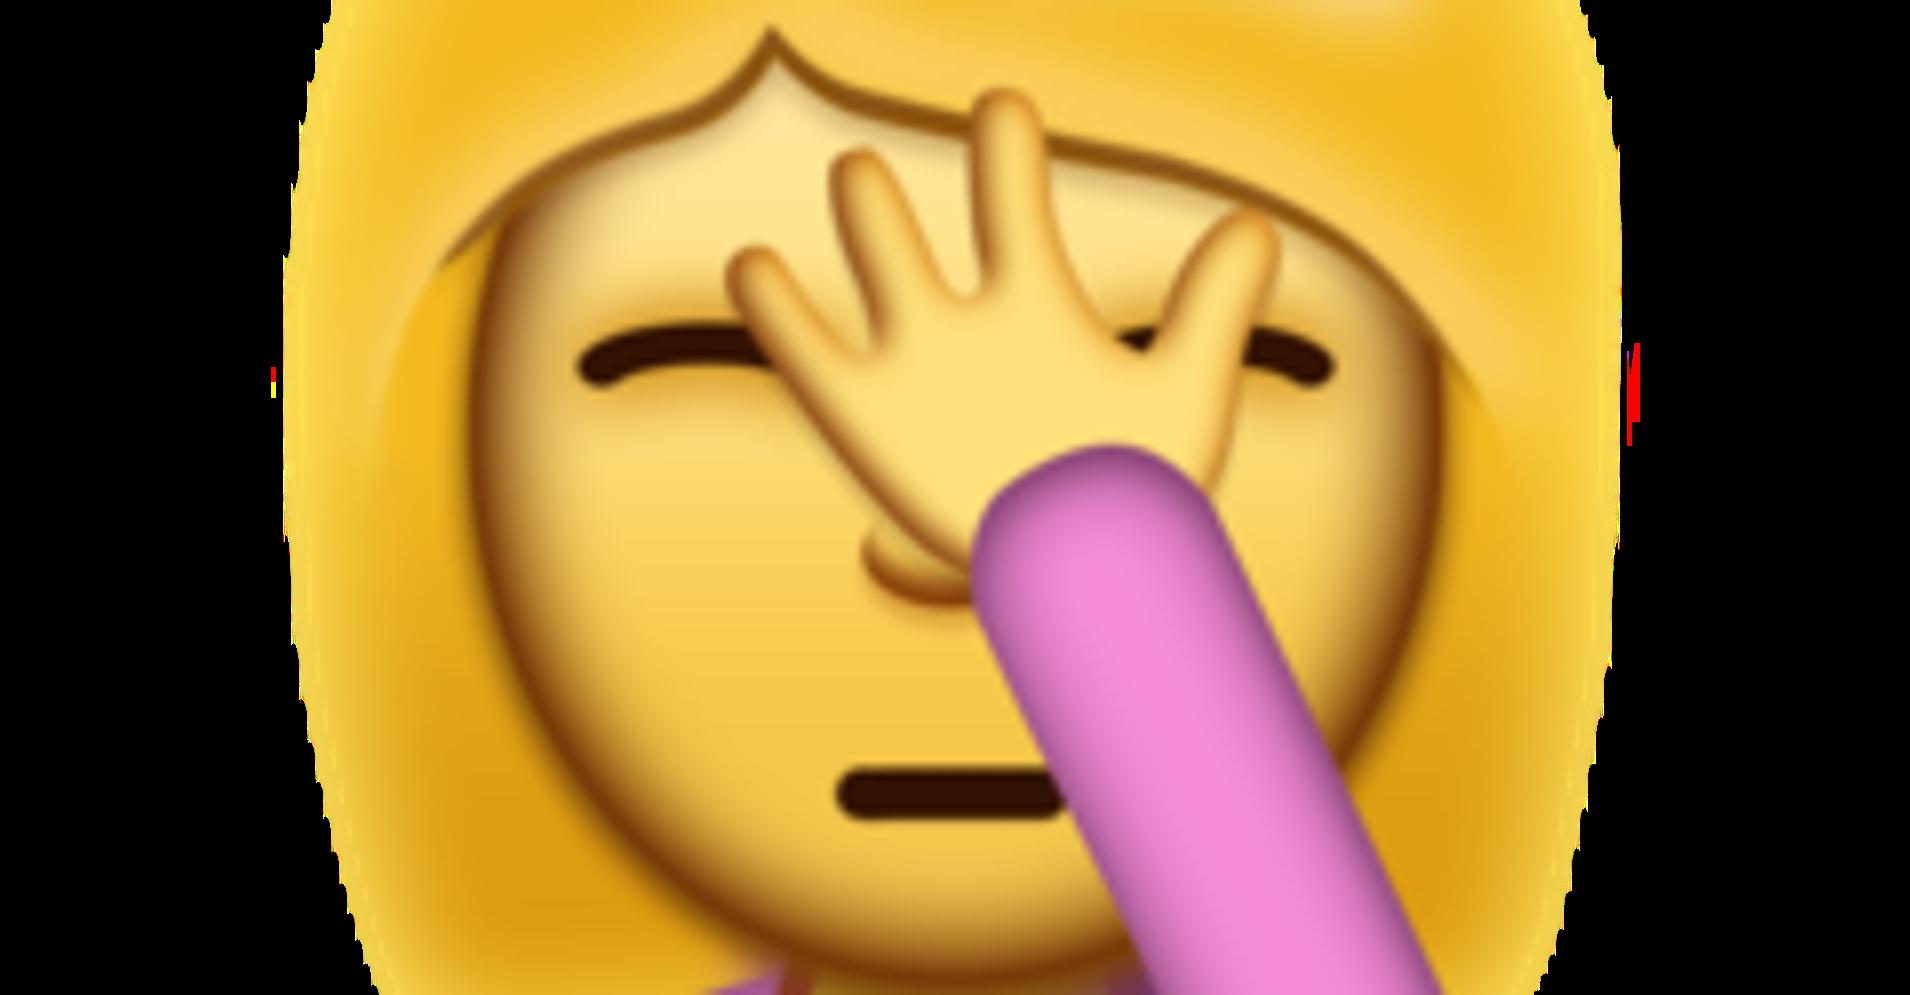 iPhone Facepalm Emoji Arrives Just In Time For U.S ...